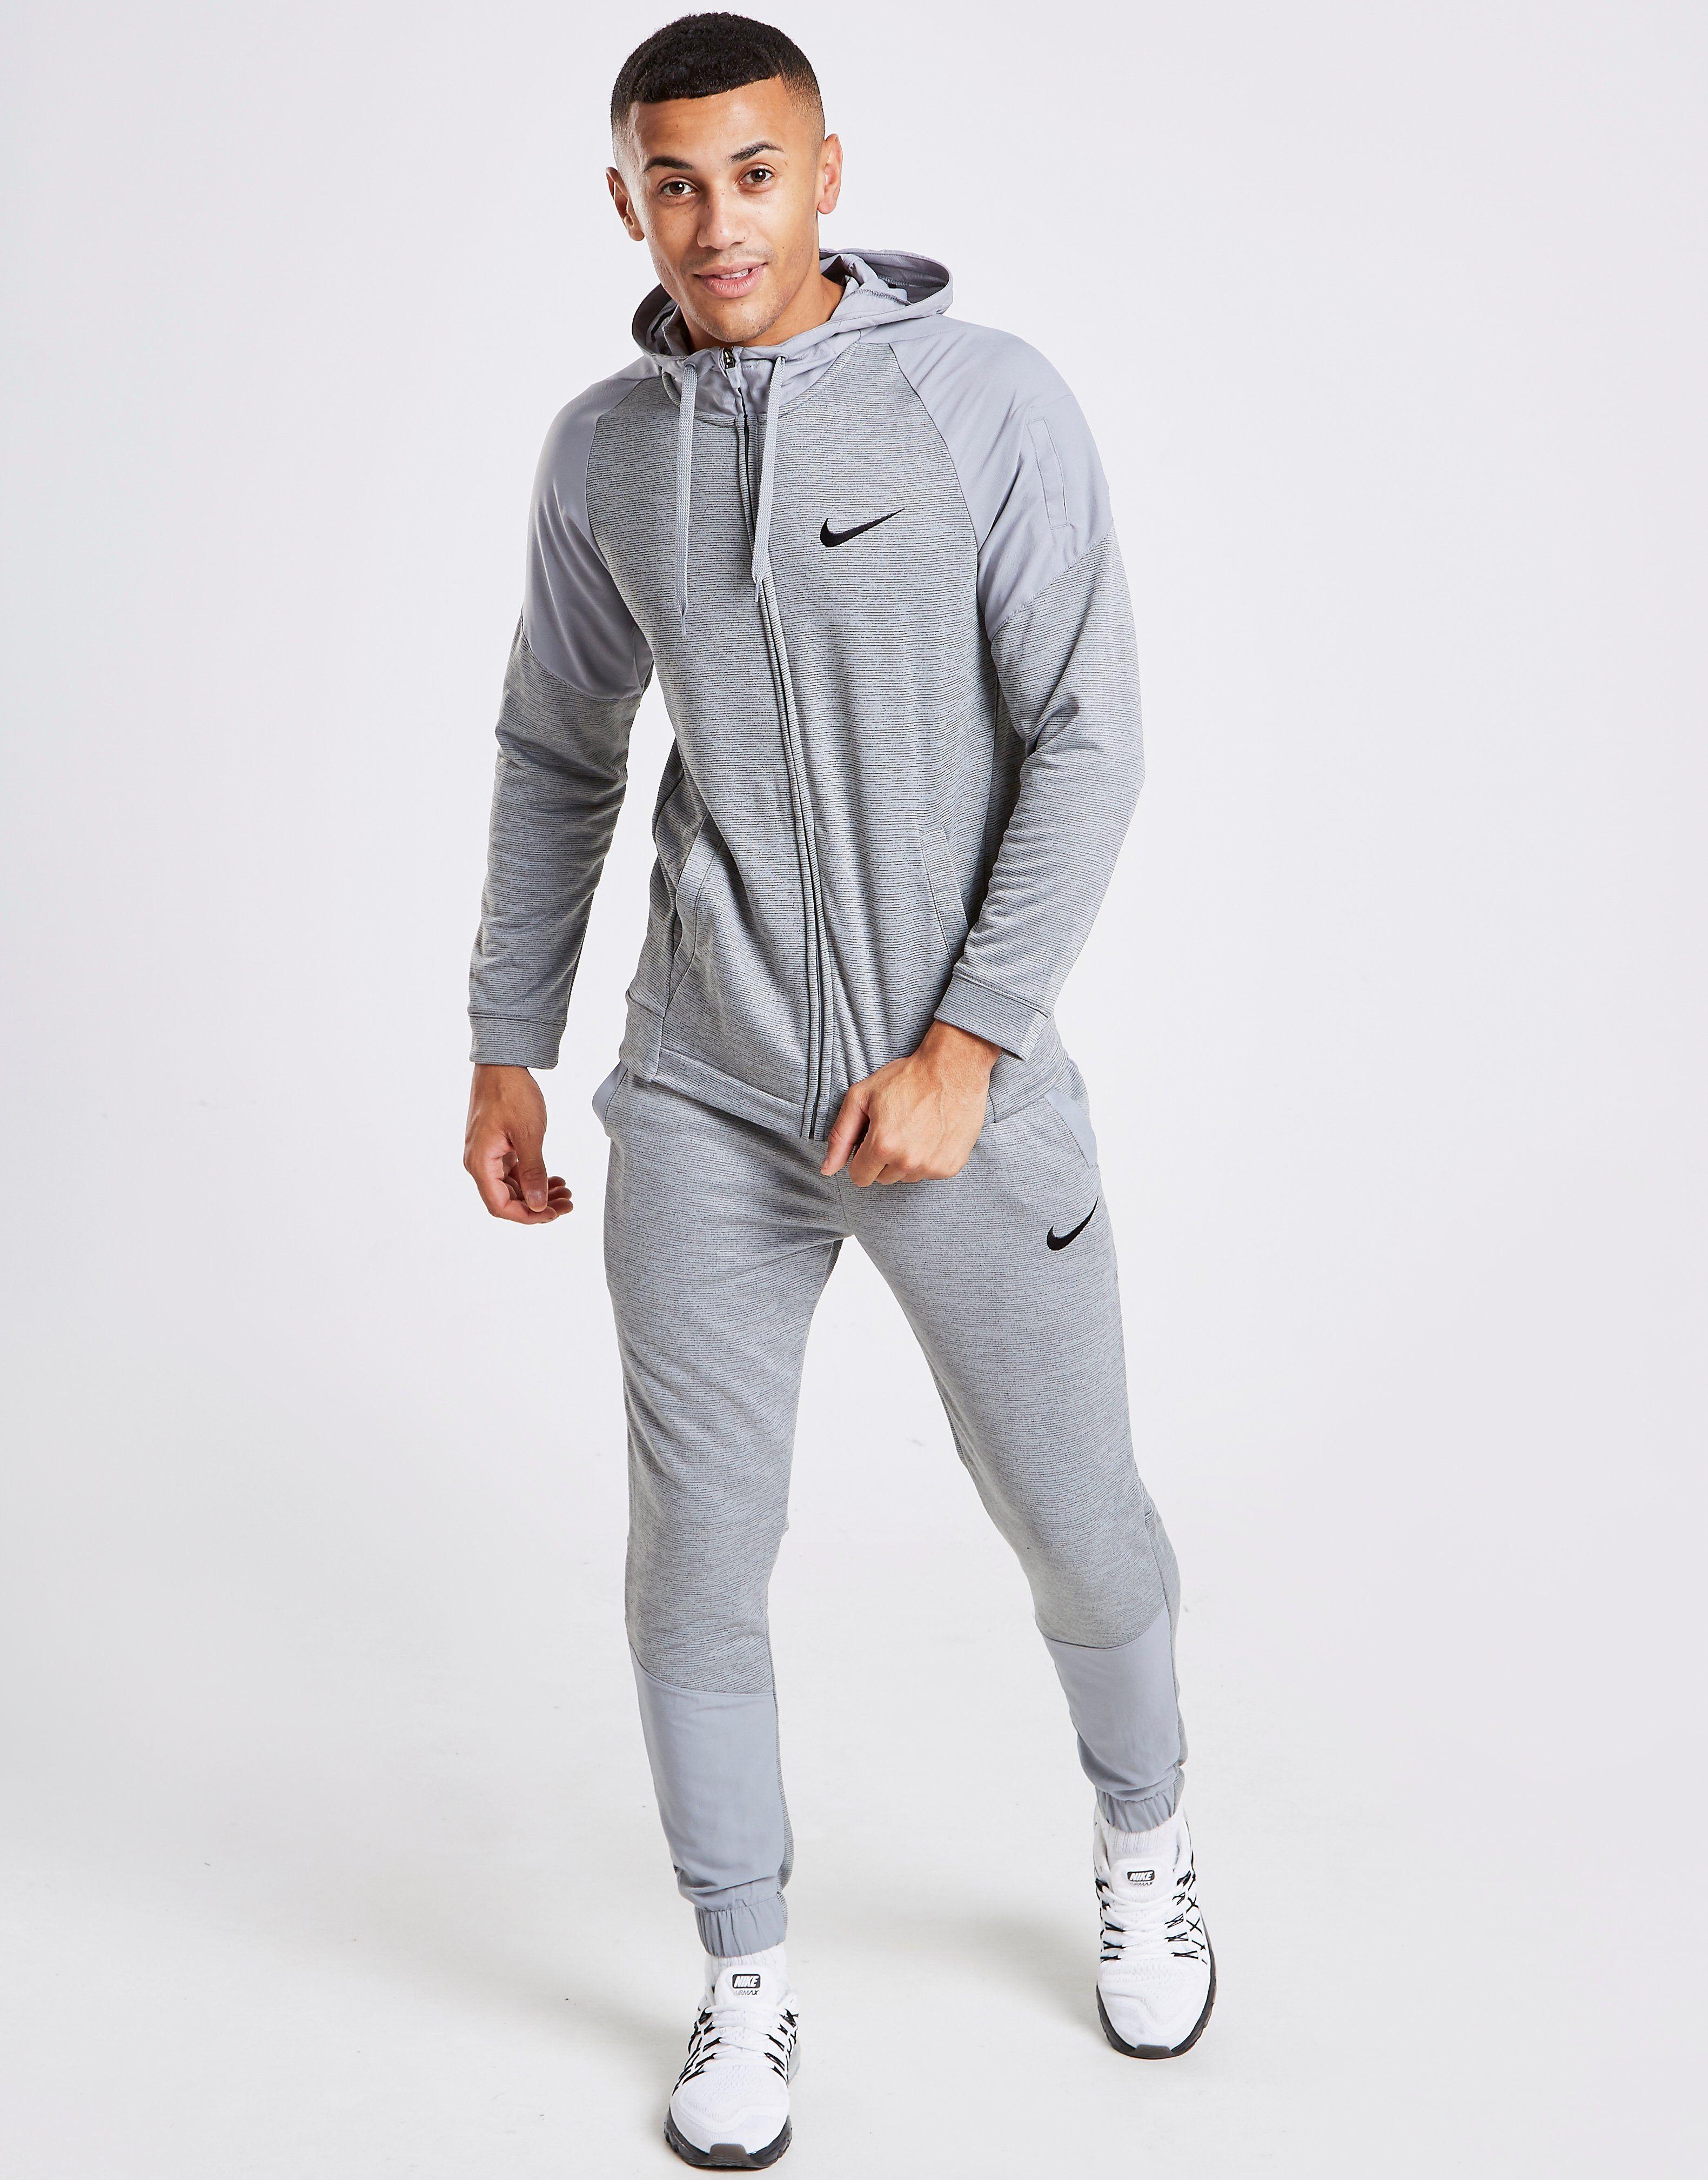 Men Nike Hoodies | JD Sports